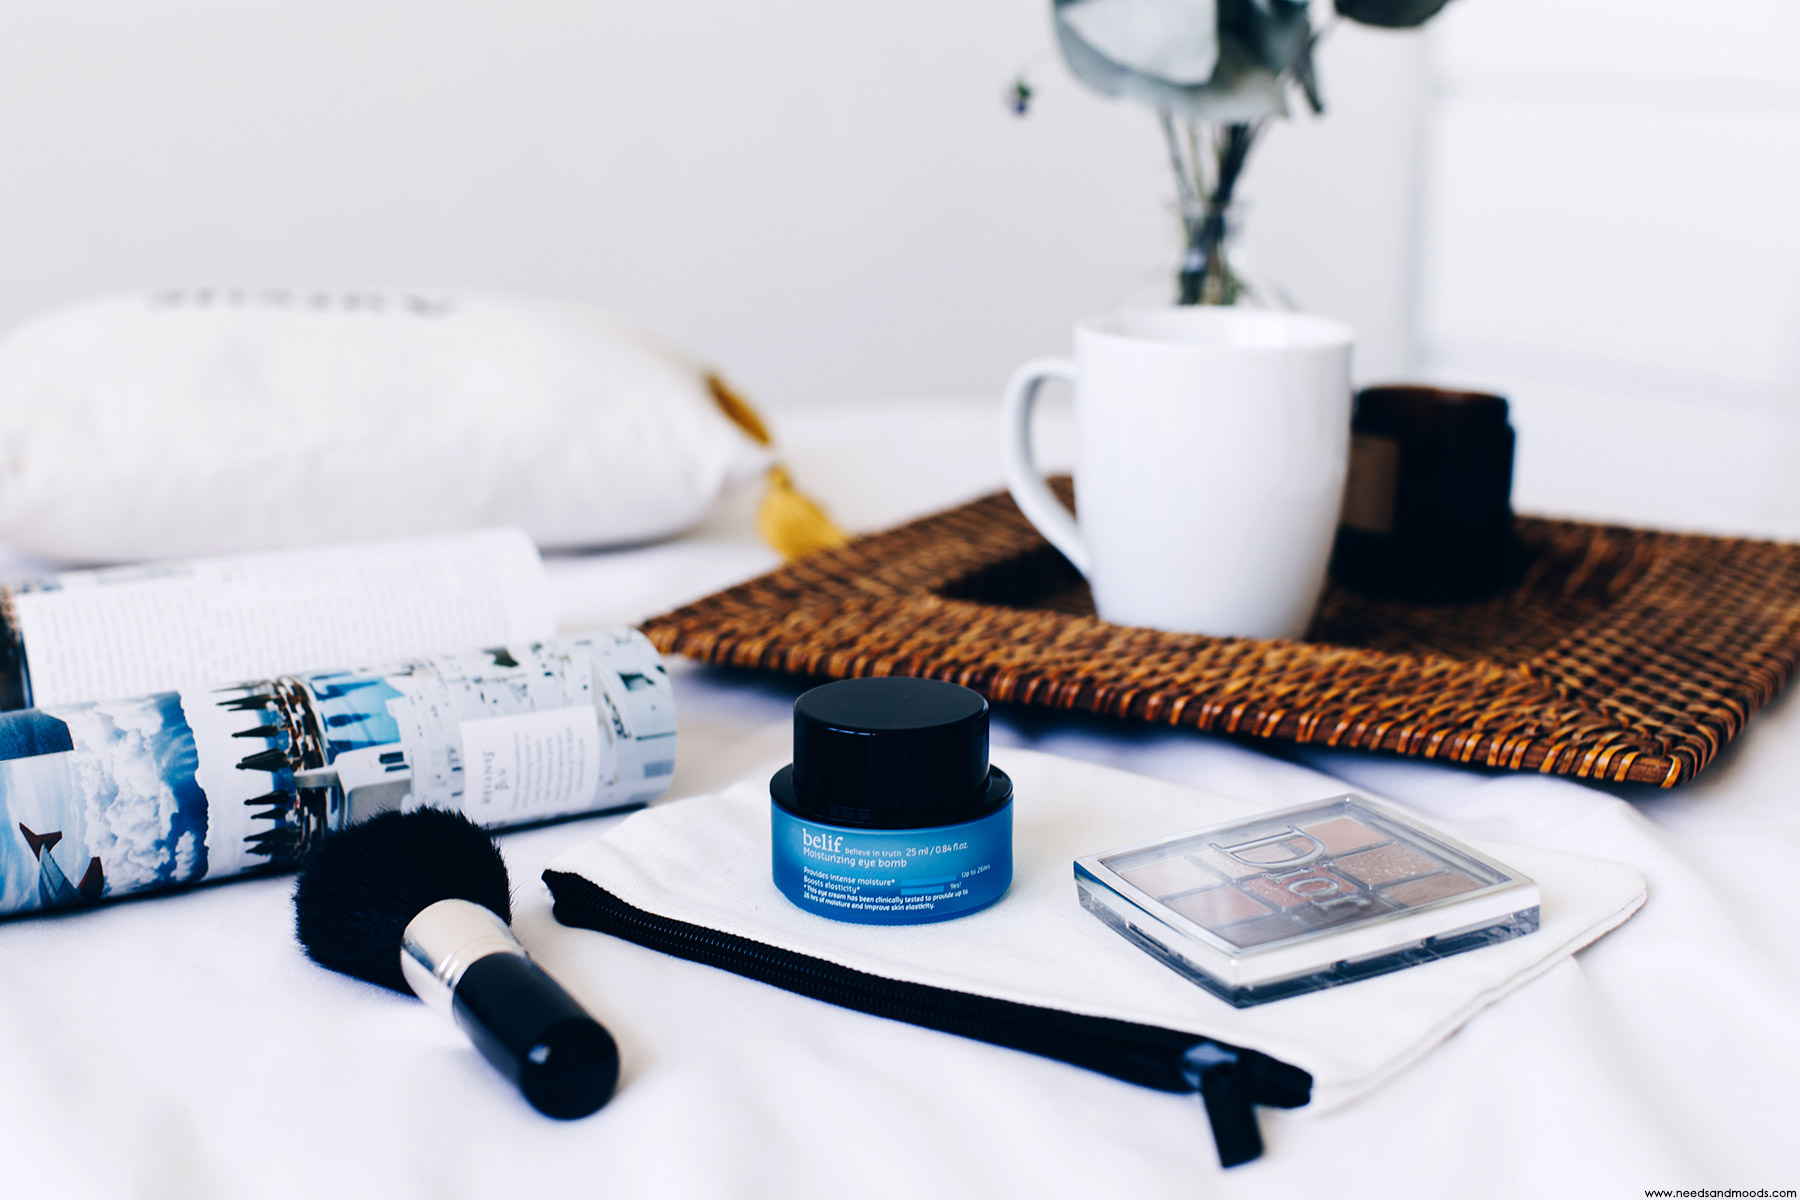 belif moisturizing eye bomb avis